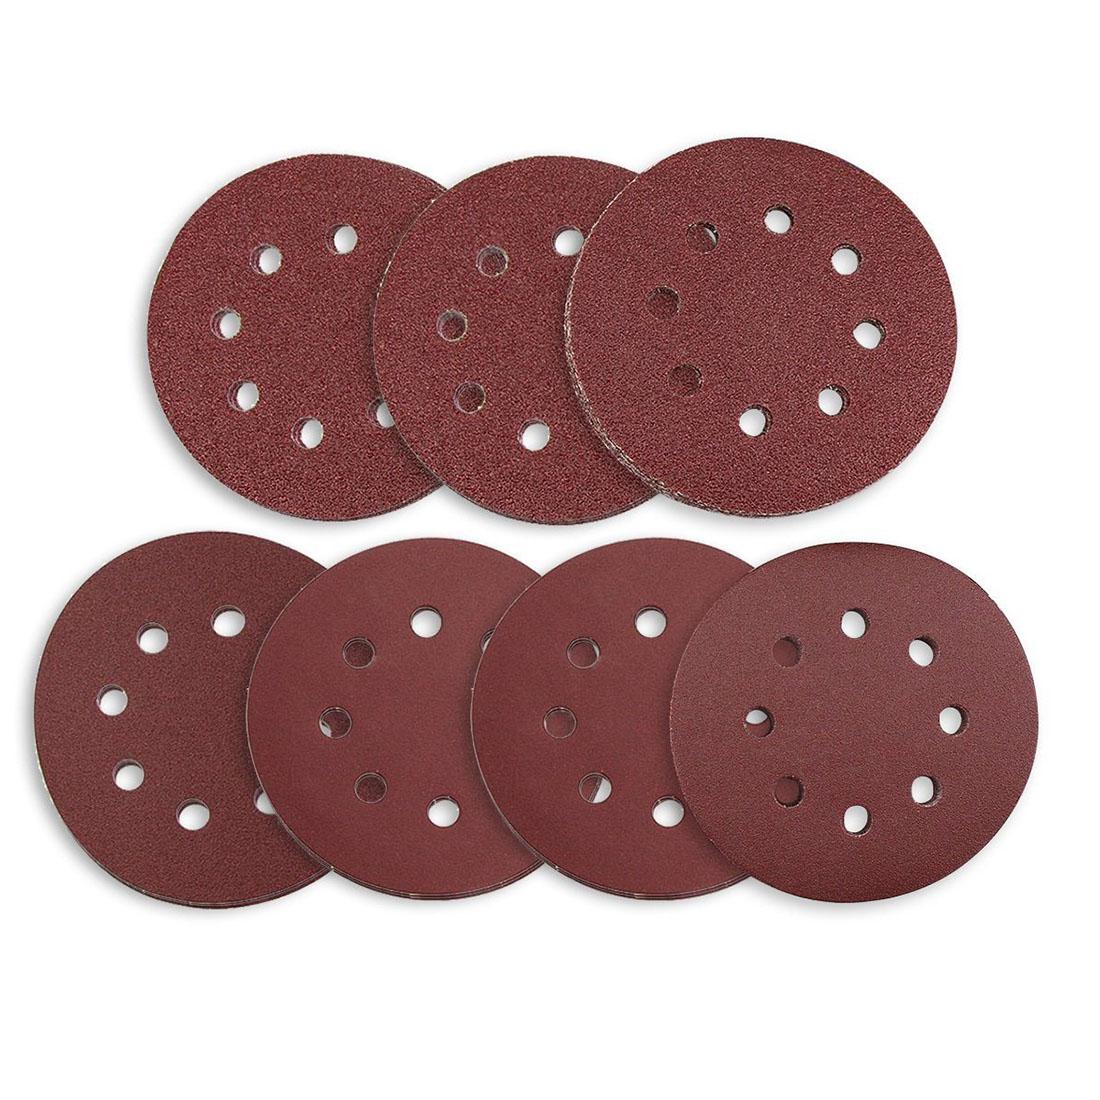 Hot sale Sanding Discs 70 Pcs 8 Holes 5 Inch Sandpaper Circular Dustless Hook and Loop 60/ 80/ 120/ 180/ 240/ 320/ 400 Grit As